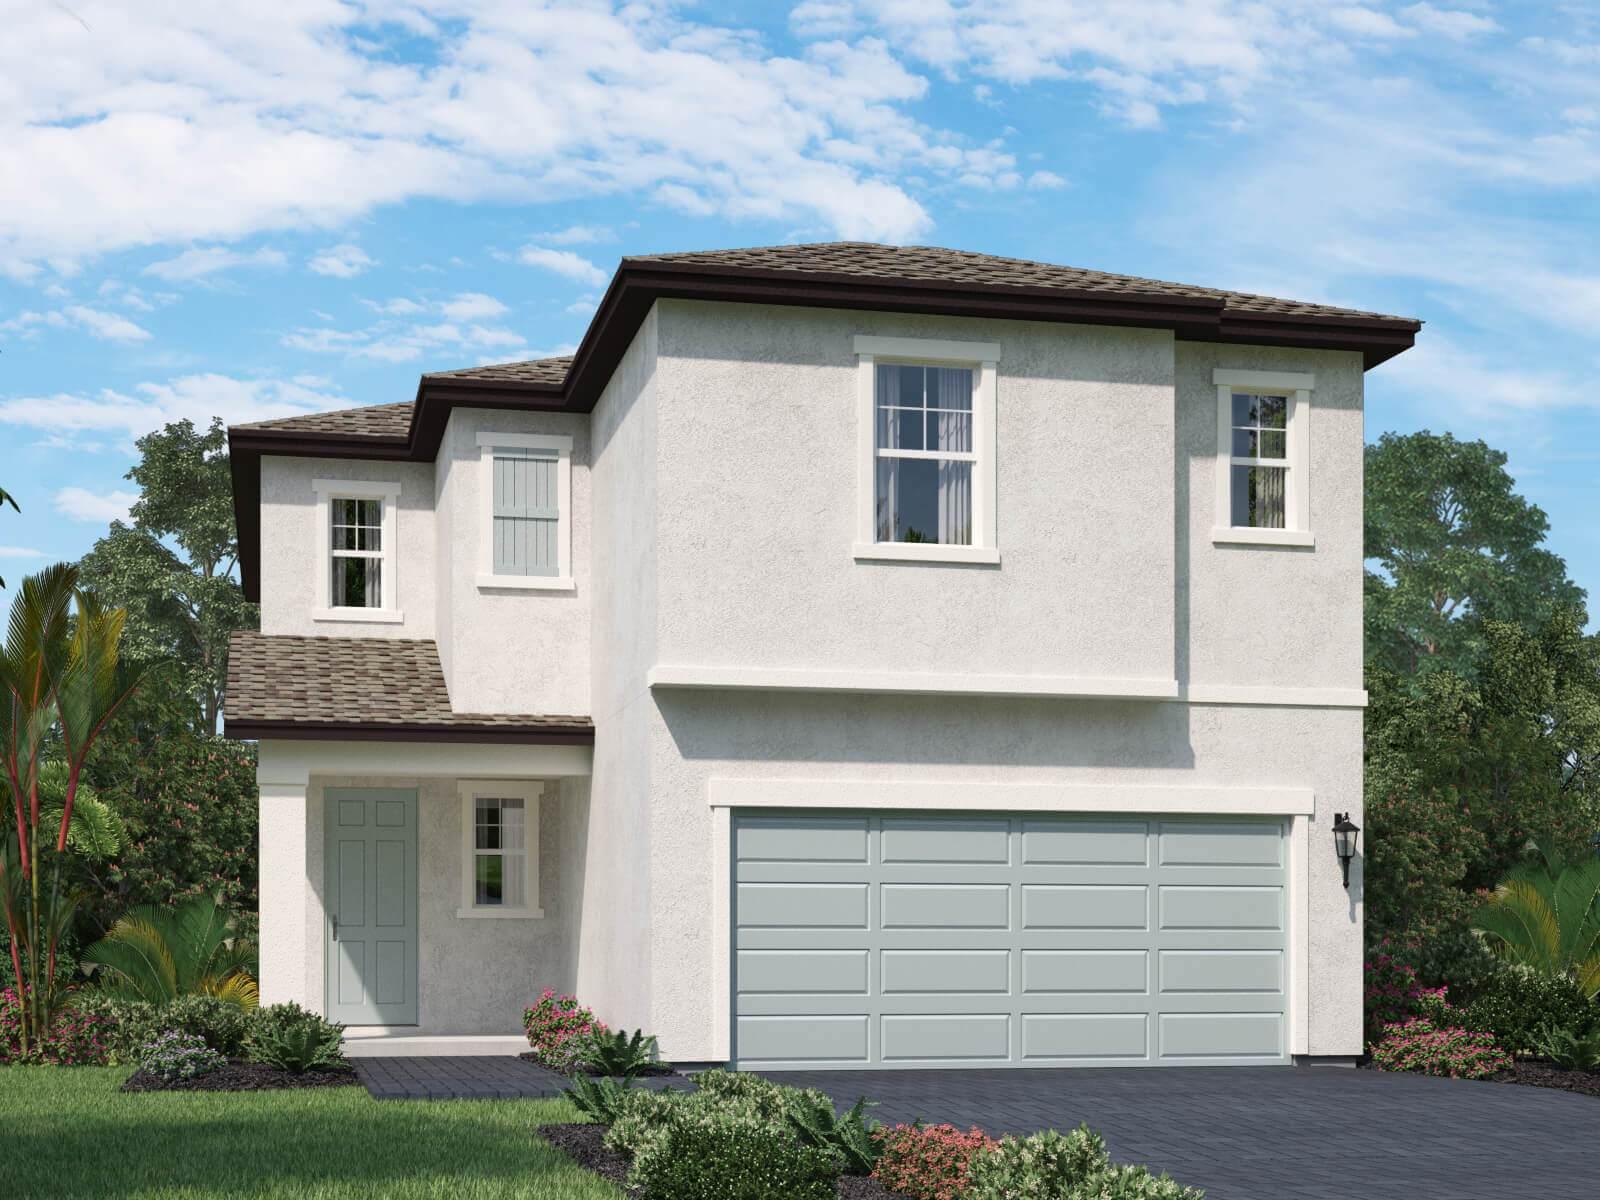 New Housing Developments in Palm Beach County, FL | NewHomeSource